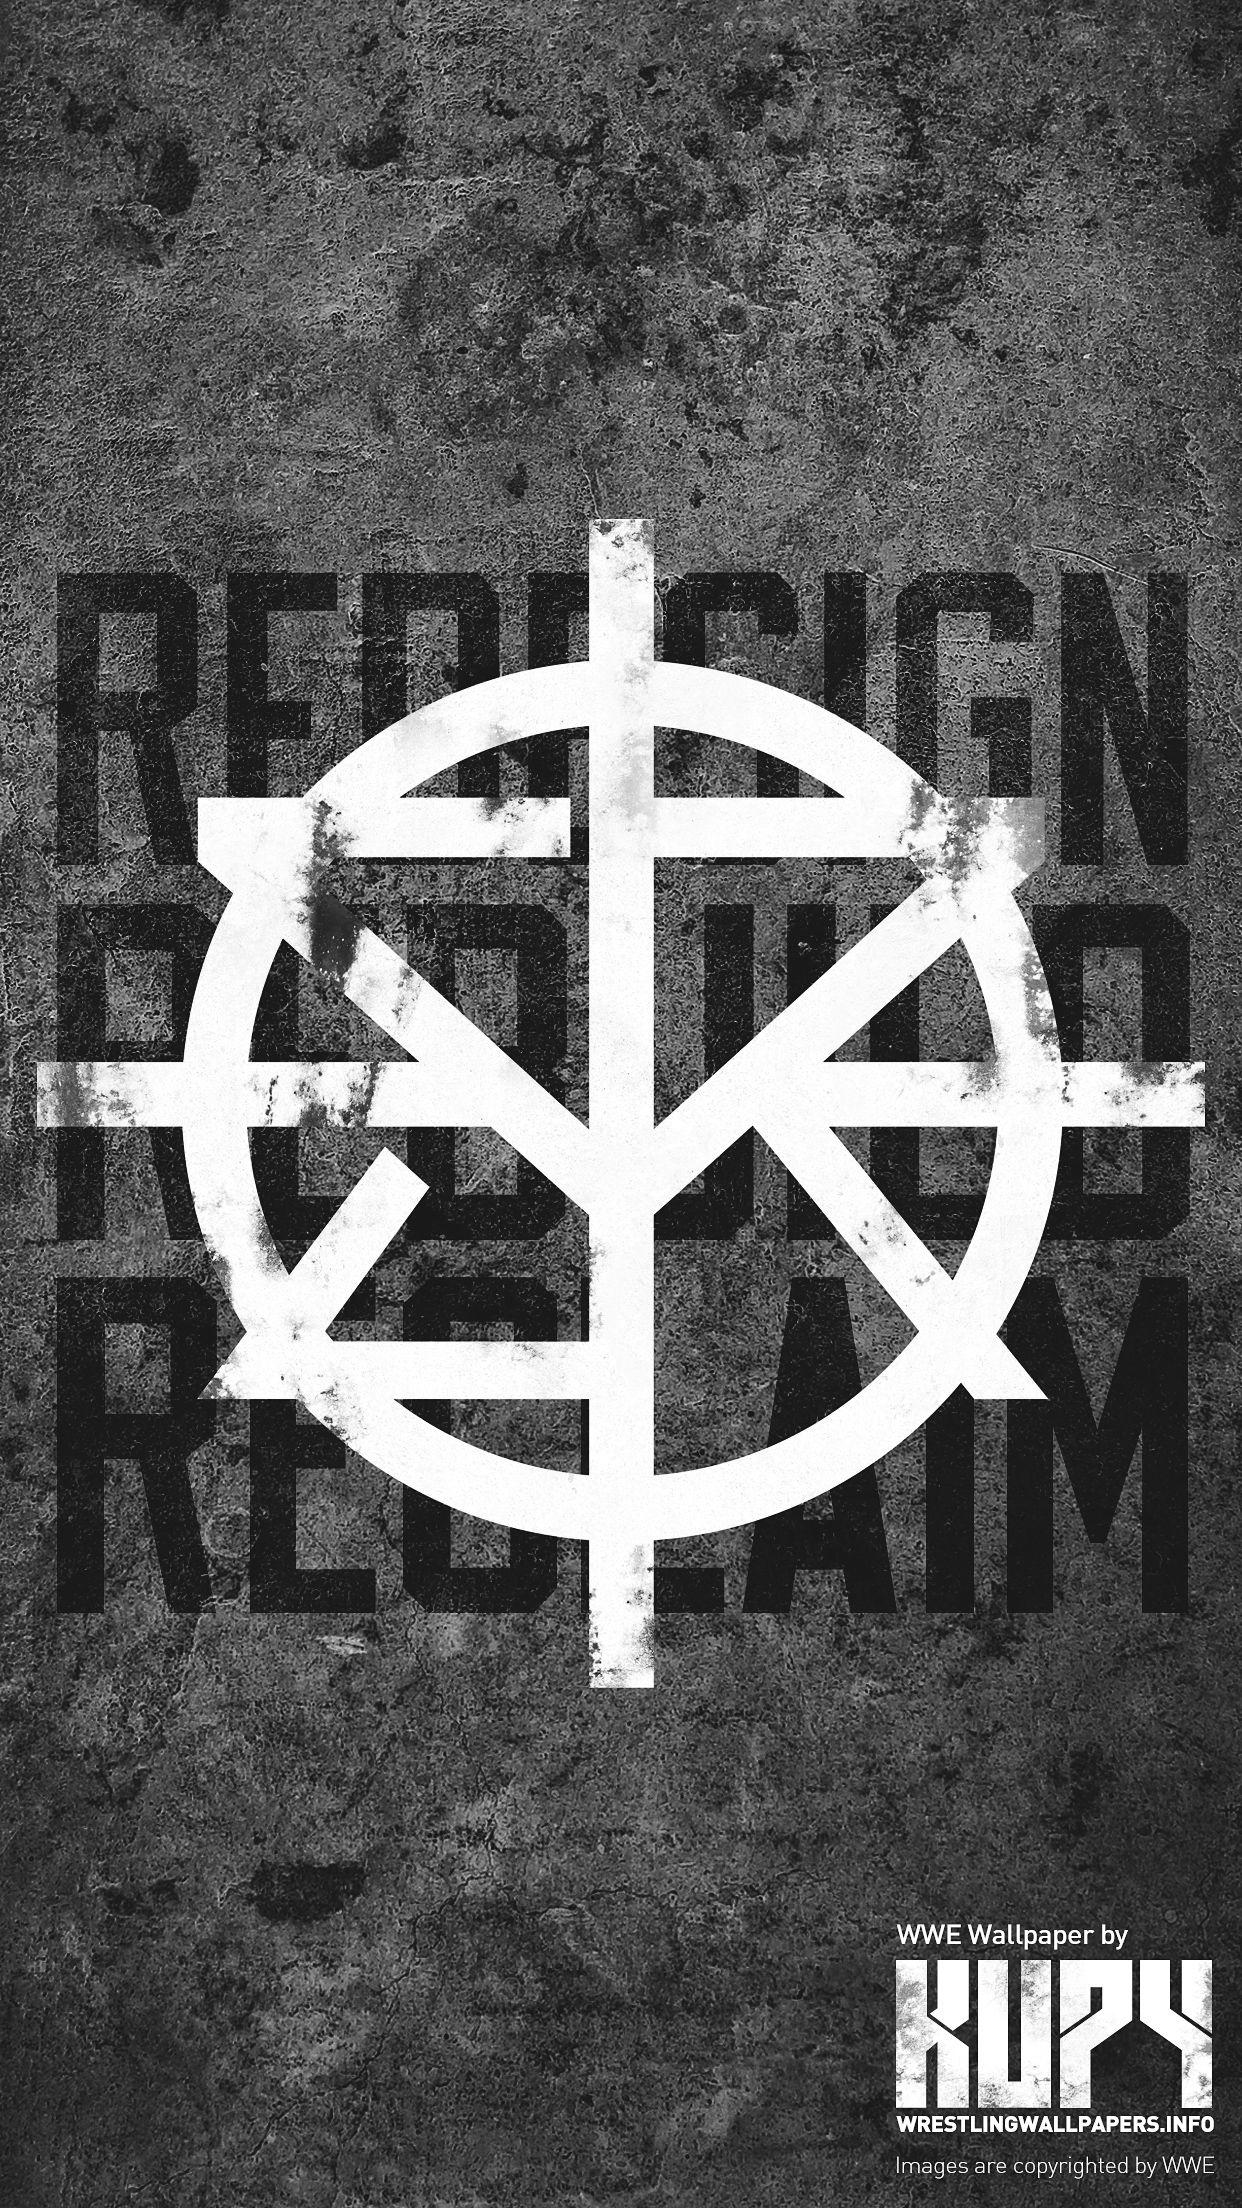 seth rollins wallpaper  Seth Rollins: Redesign Rebuild Reclaim   Set rollins   Pinterest ...